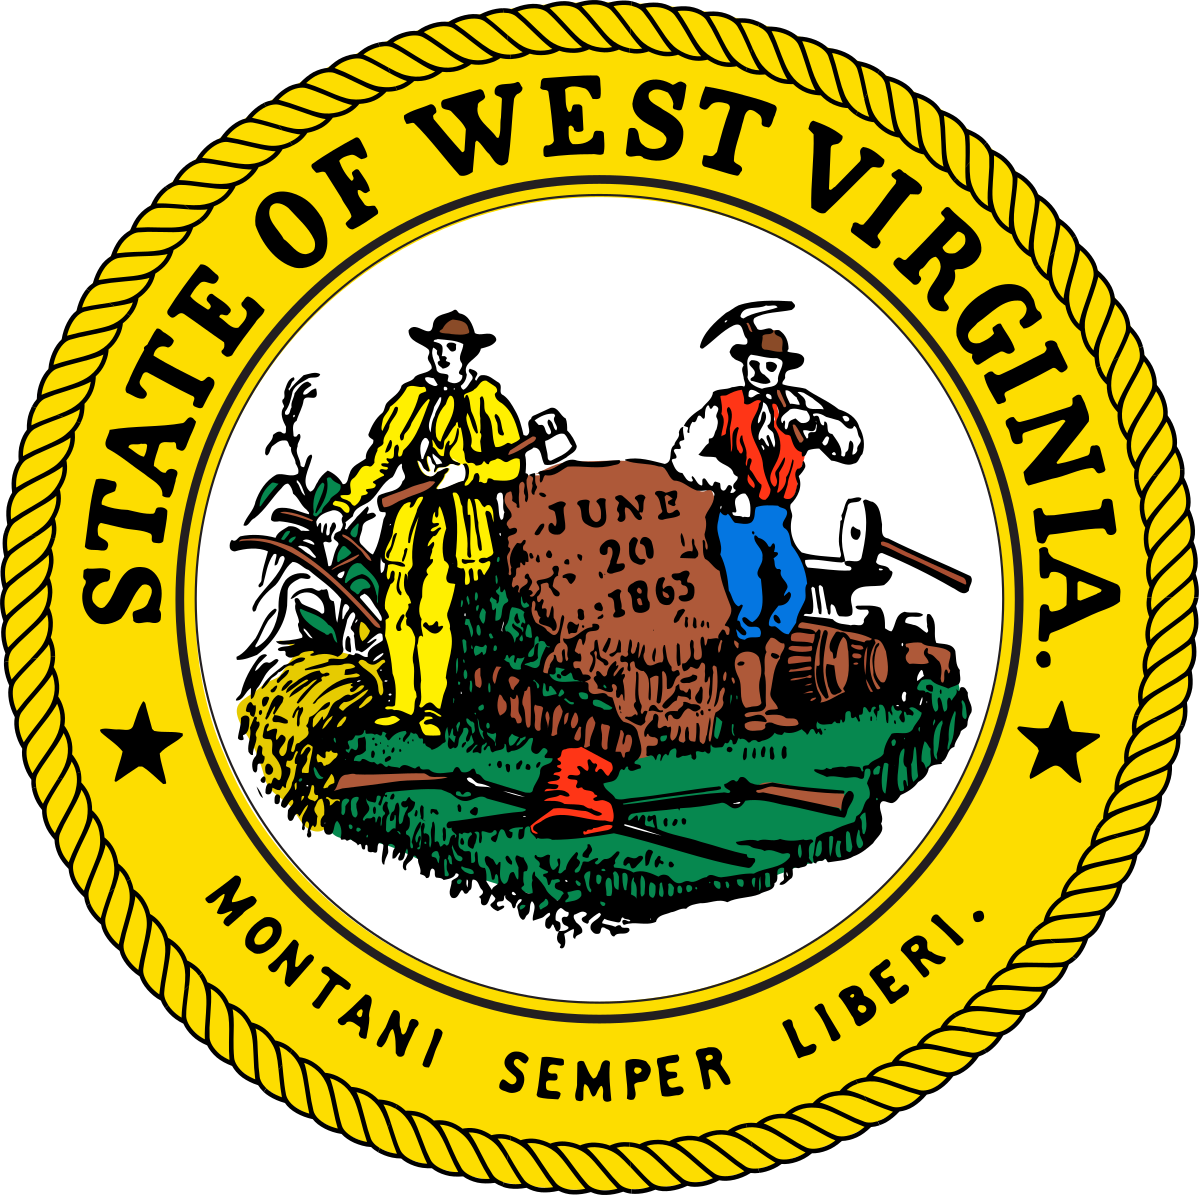 Virginia general assembly clipart vector stock West Virginia Legislature - Wikipedia vector stock